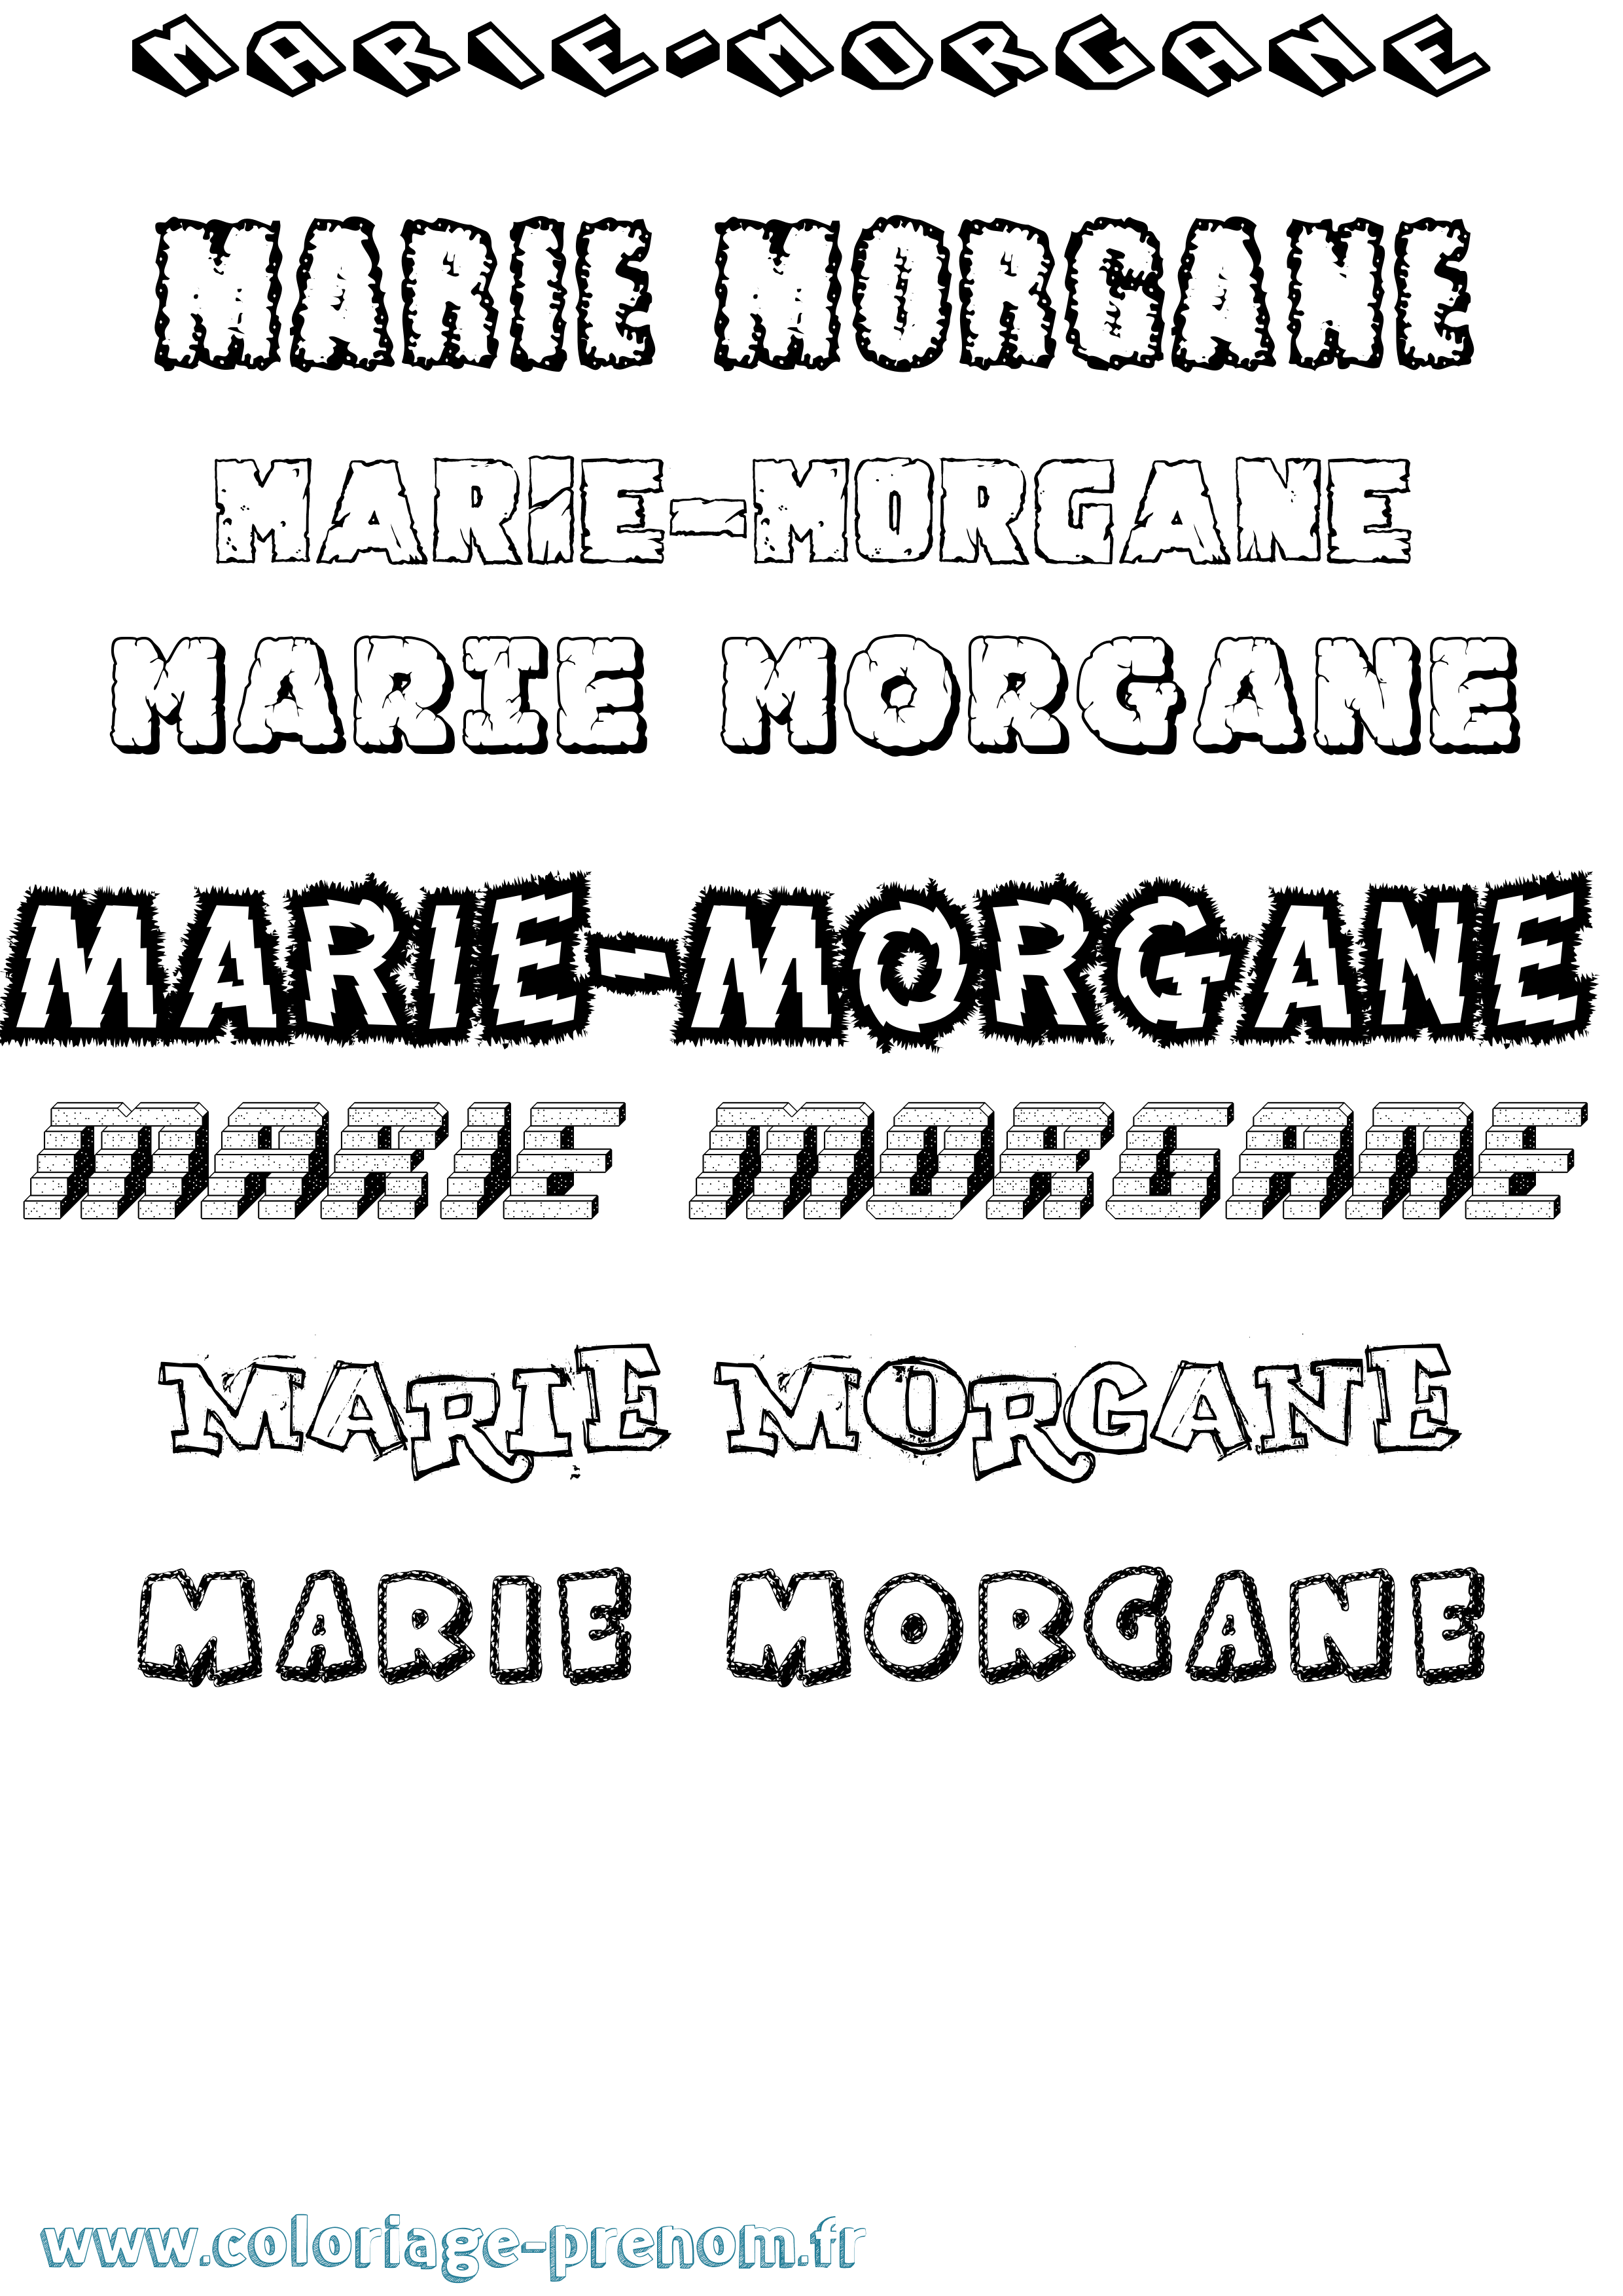 Coloriage du prénom Marie-morgane : à Imprimer ou ...